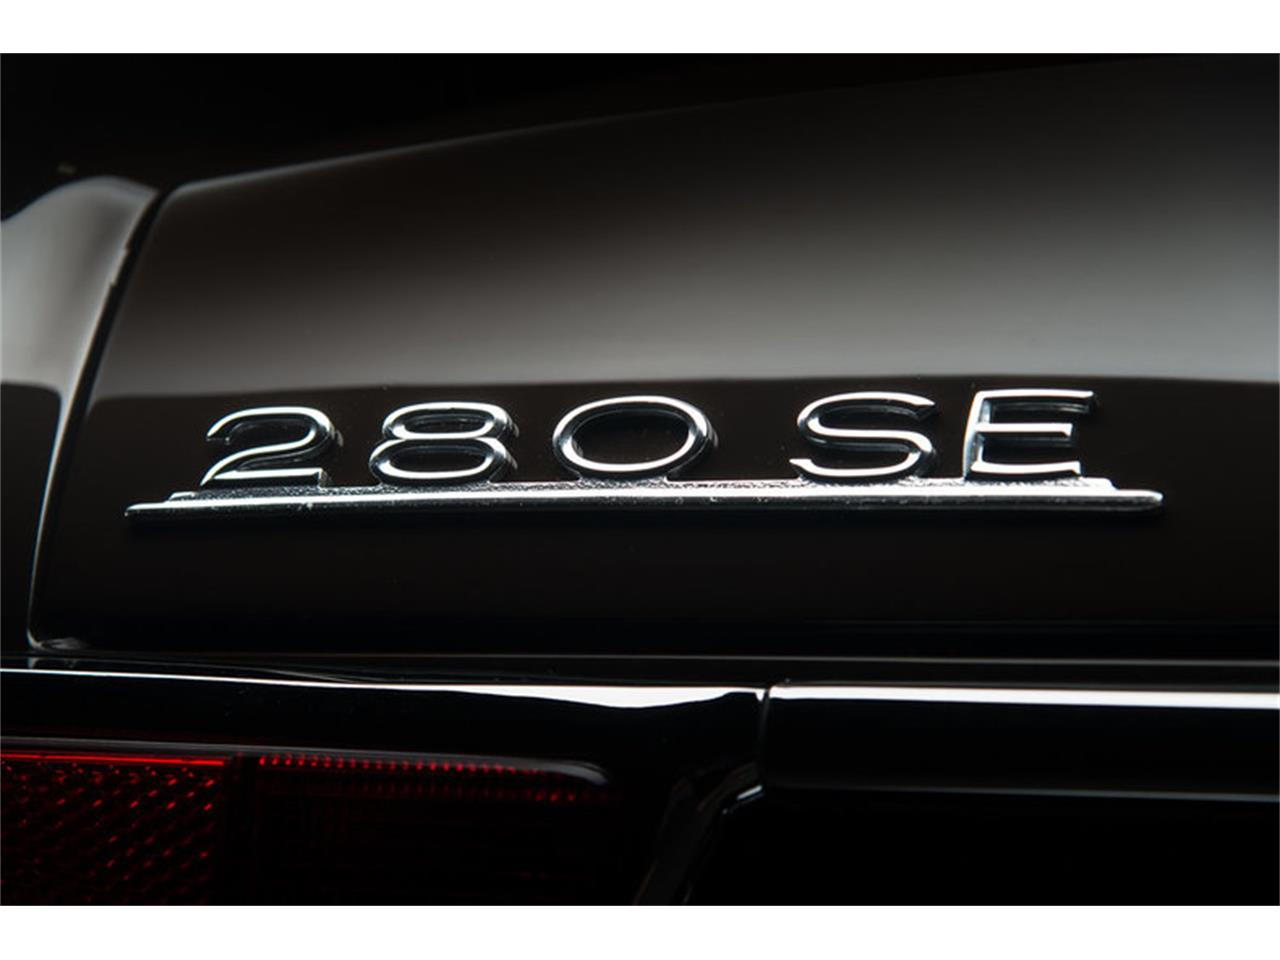 Large Picture of 1971 Mercedes-Benz 280 SE 3.5 Cabriolet Auction Vehicle - G0JQ